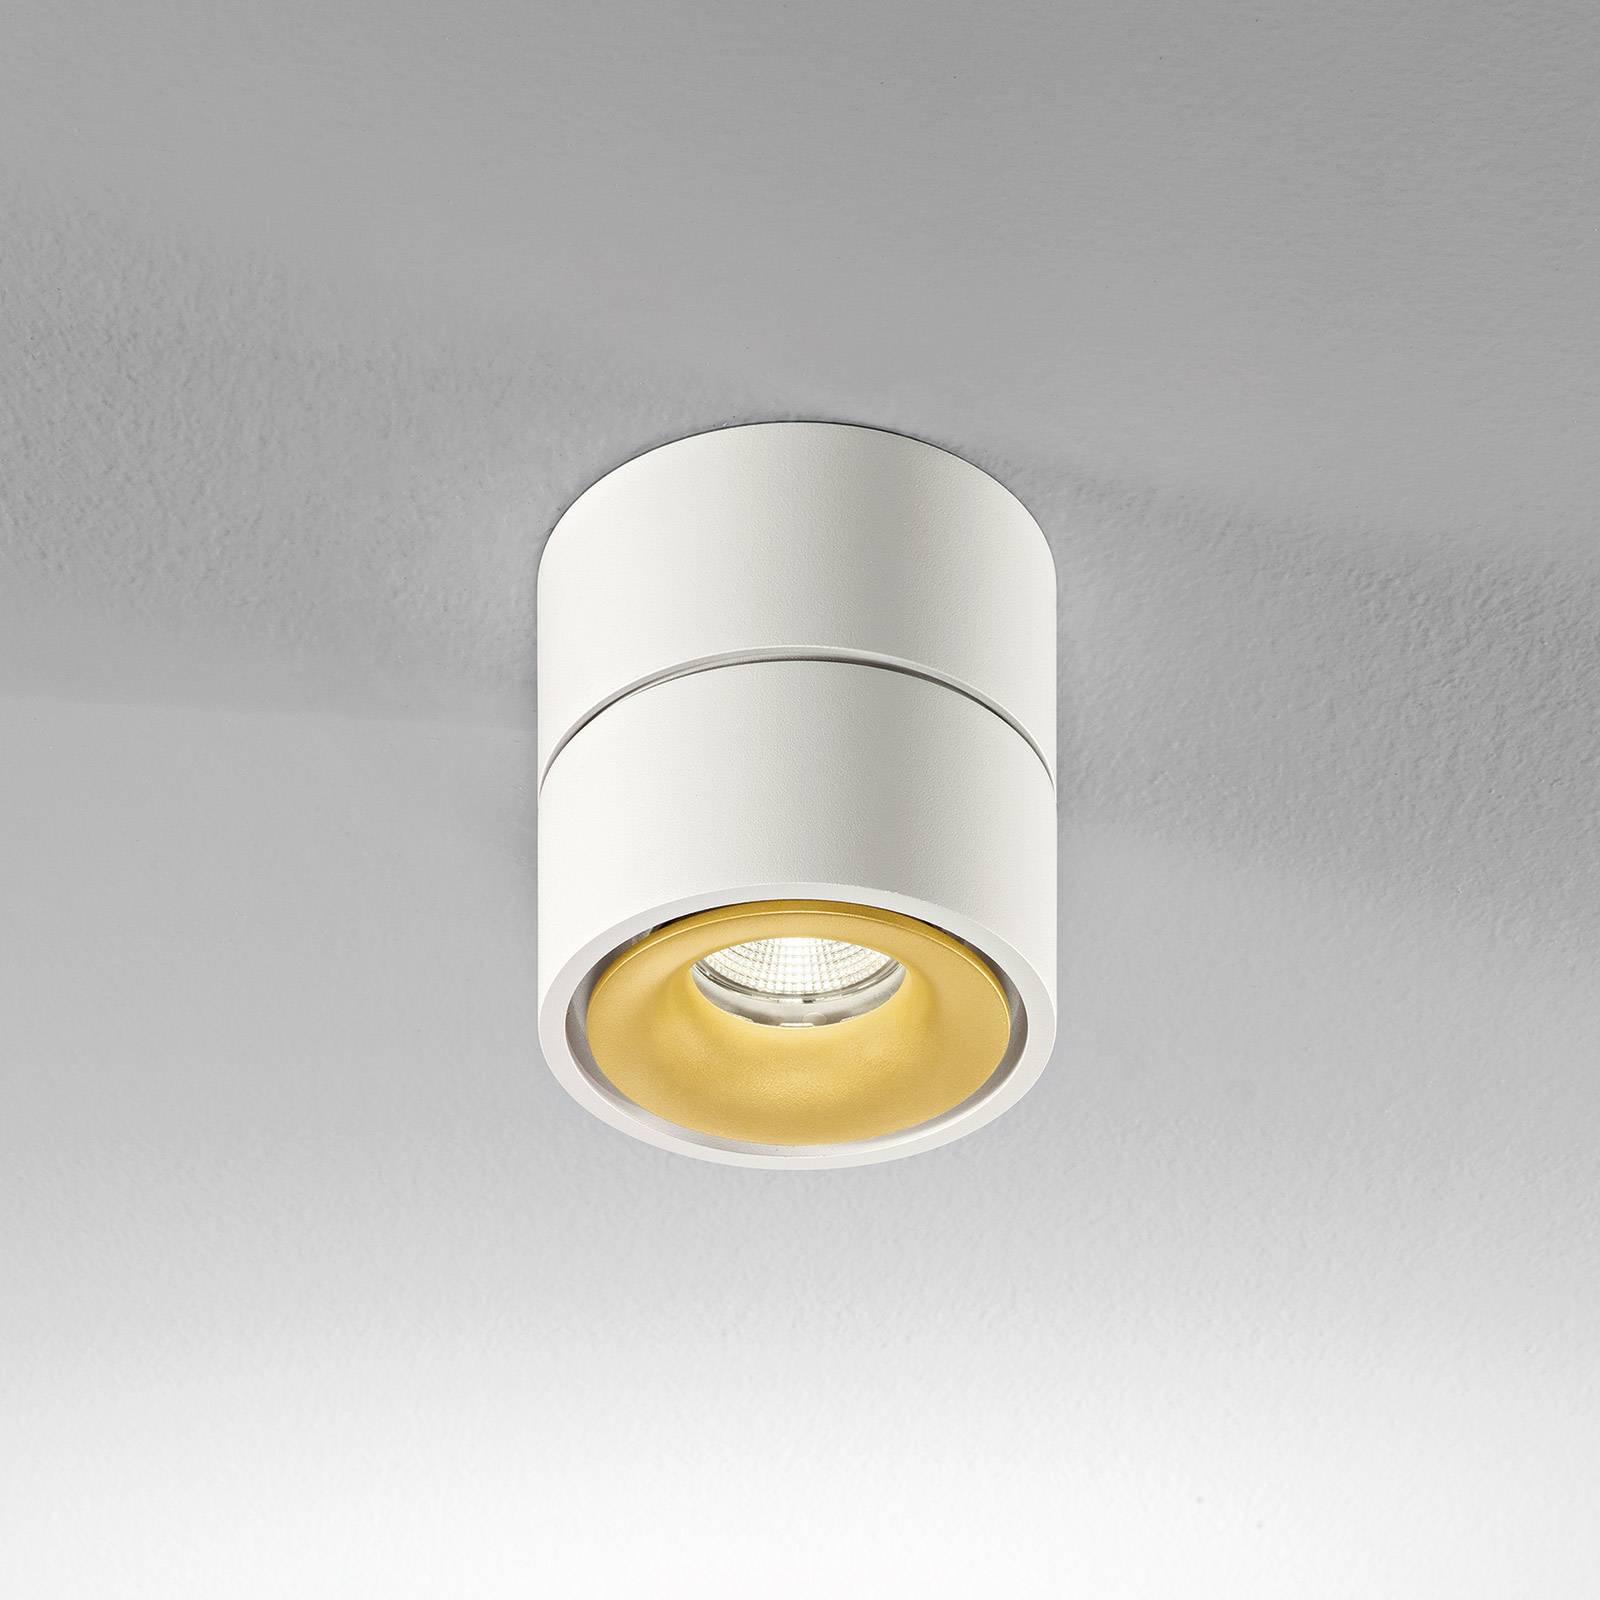 Egger Clippo -LED-kattospotti dim-to-warm kulta